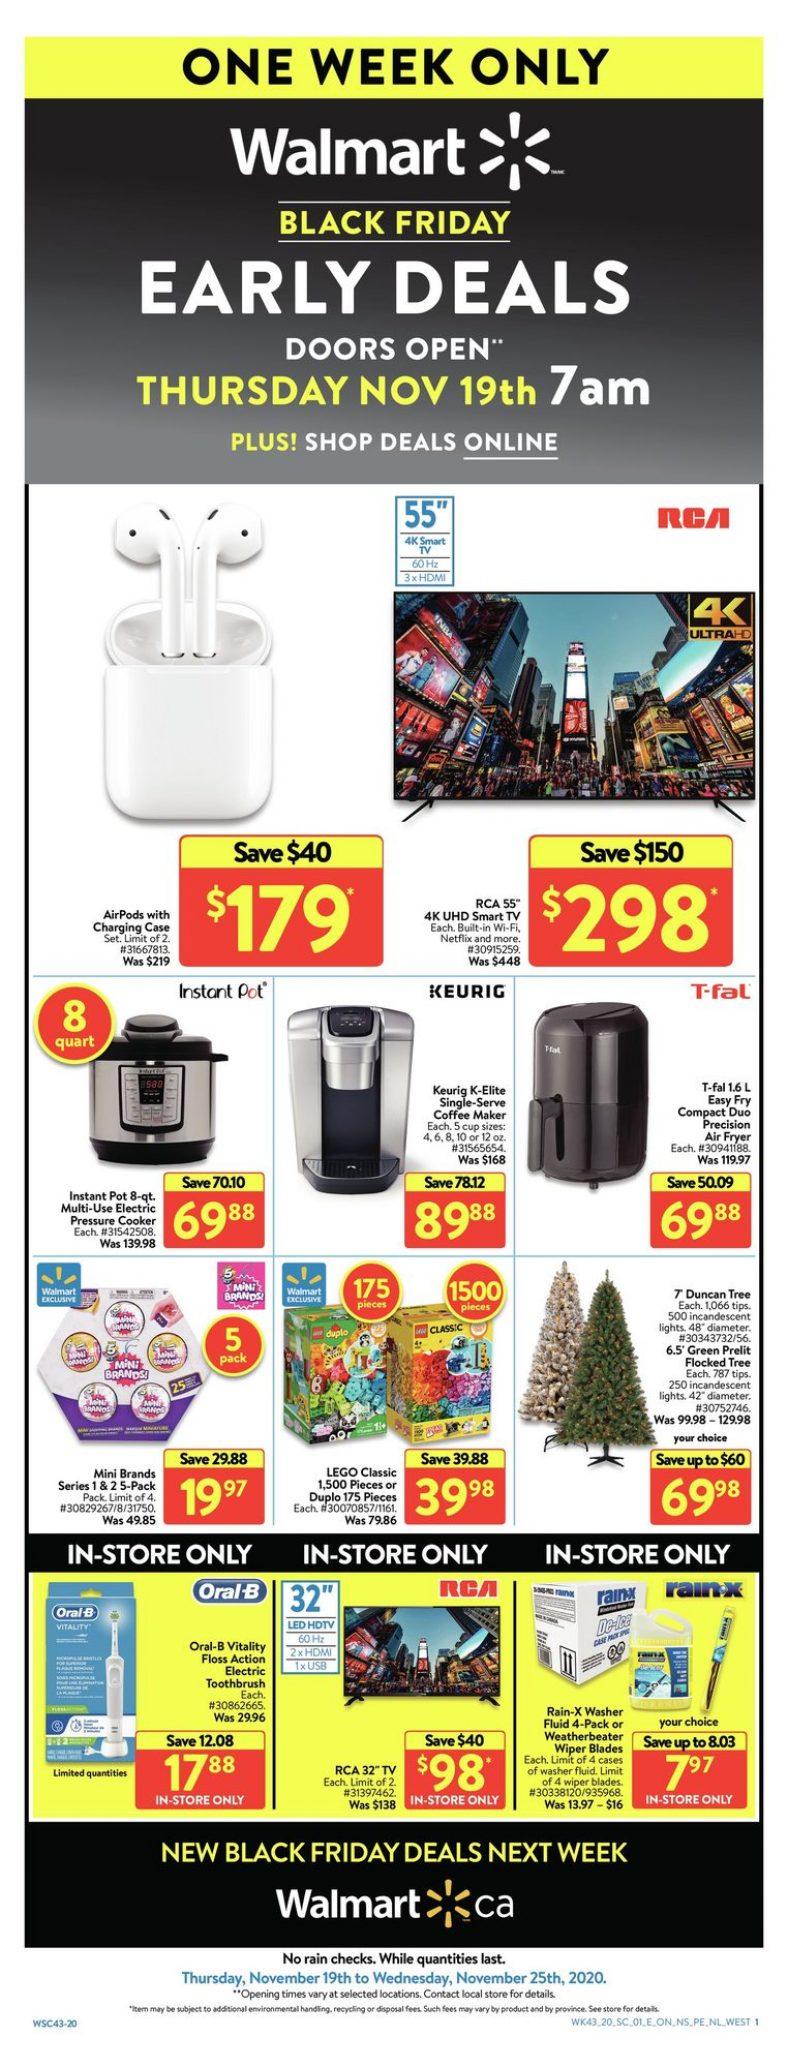 01 Walmart Supercentre Flyer November 19 November 25 2020. Black Friday Early Deals